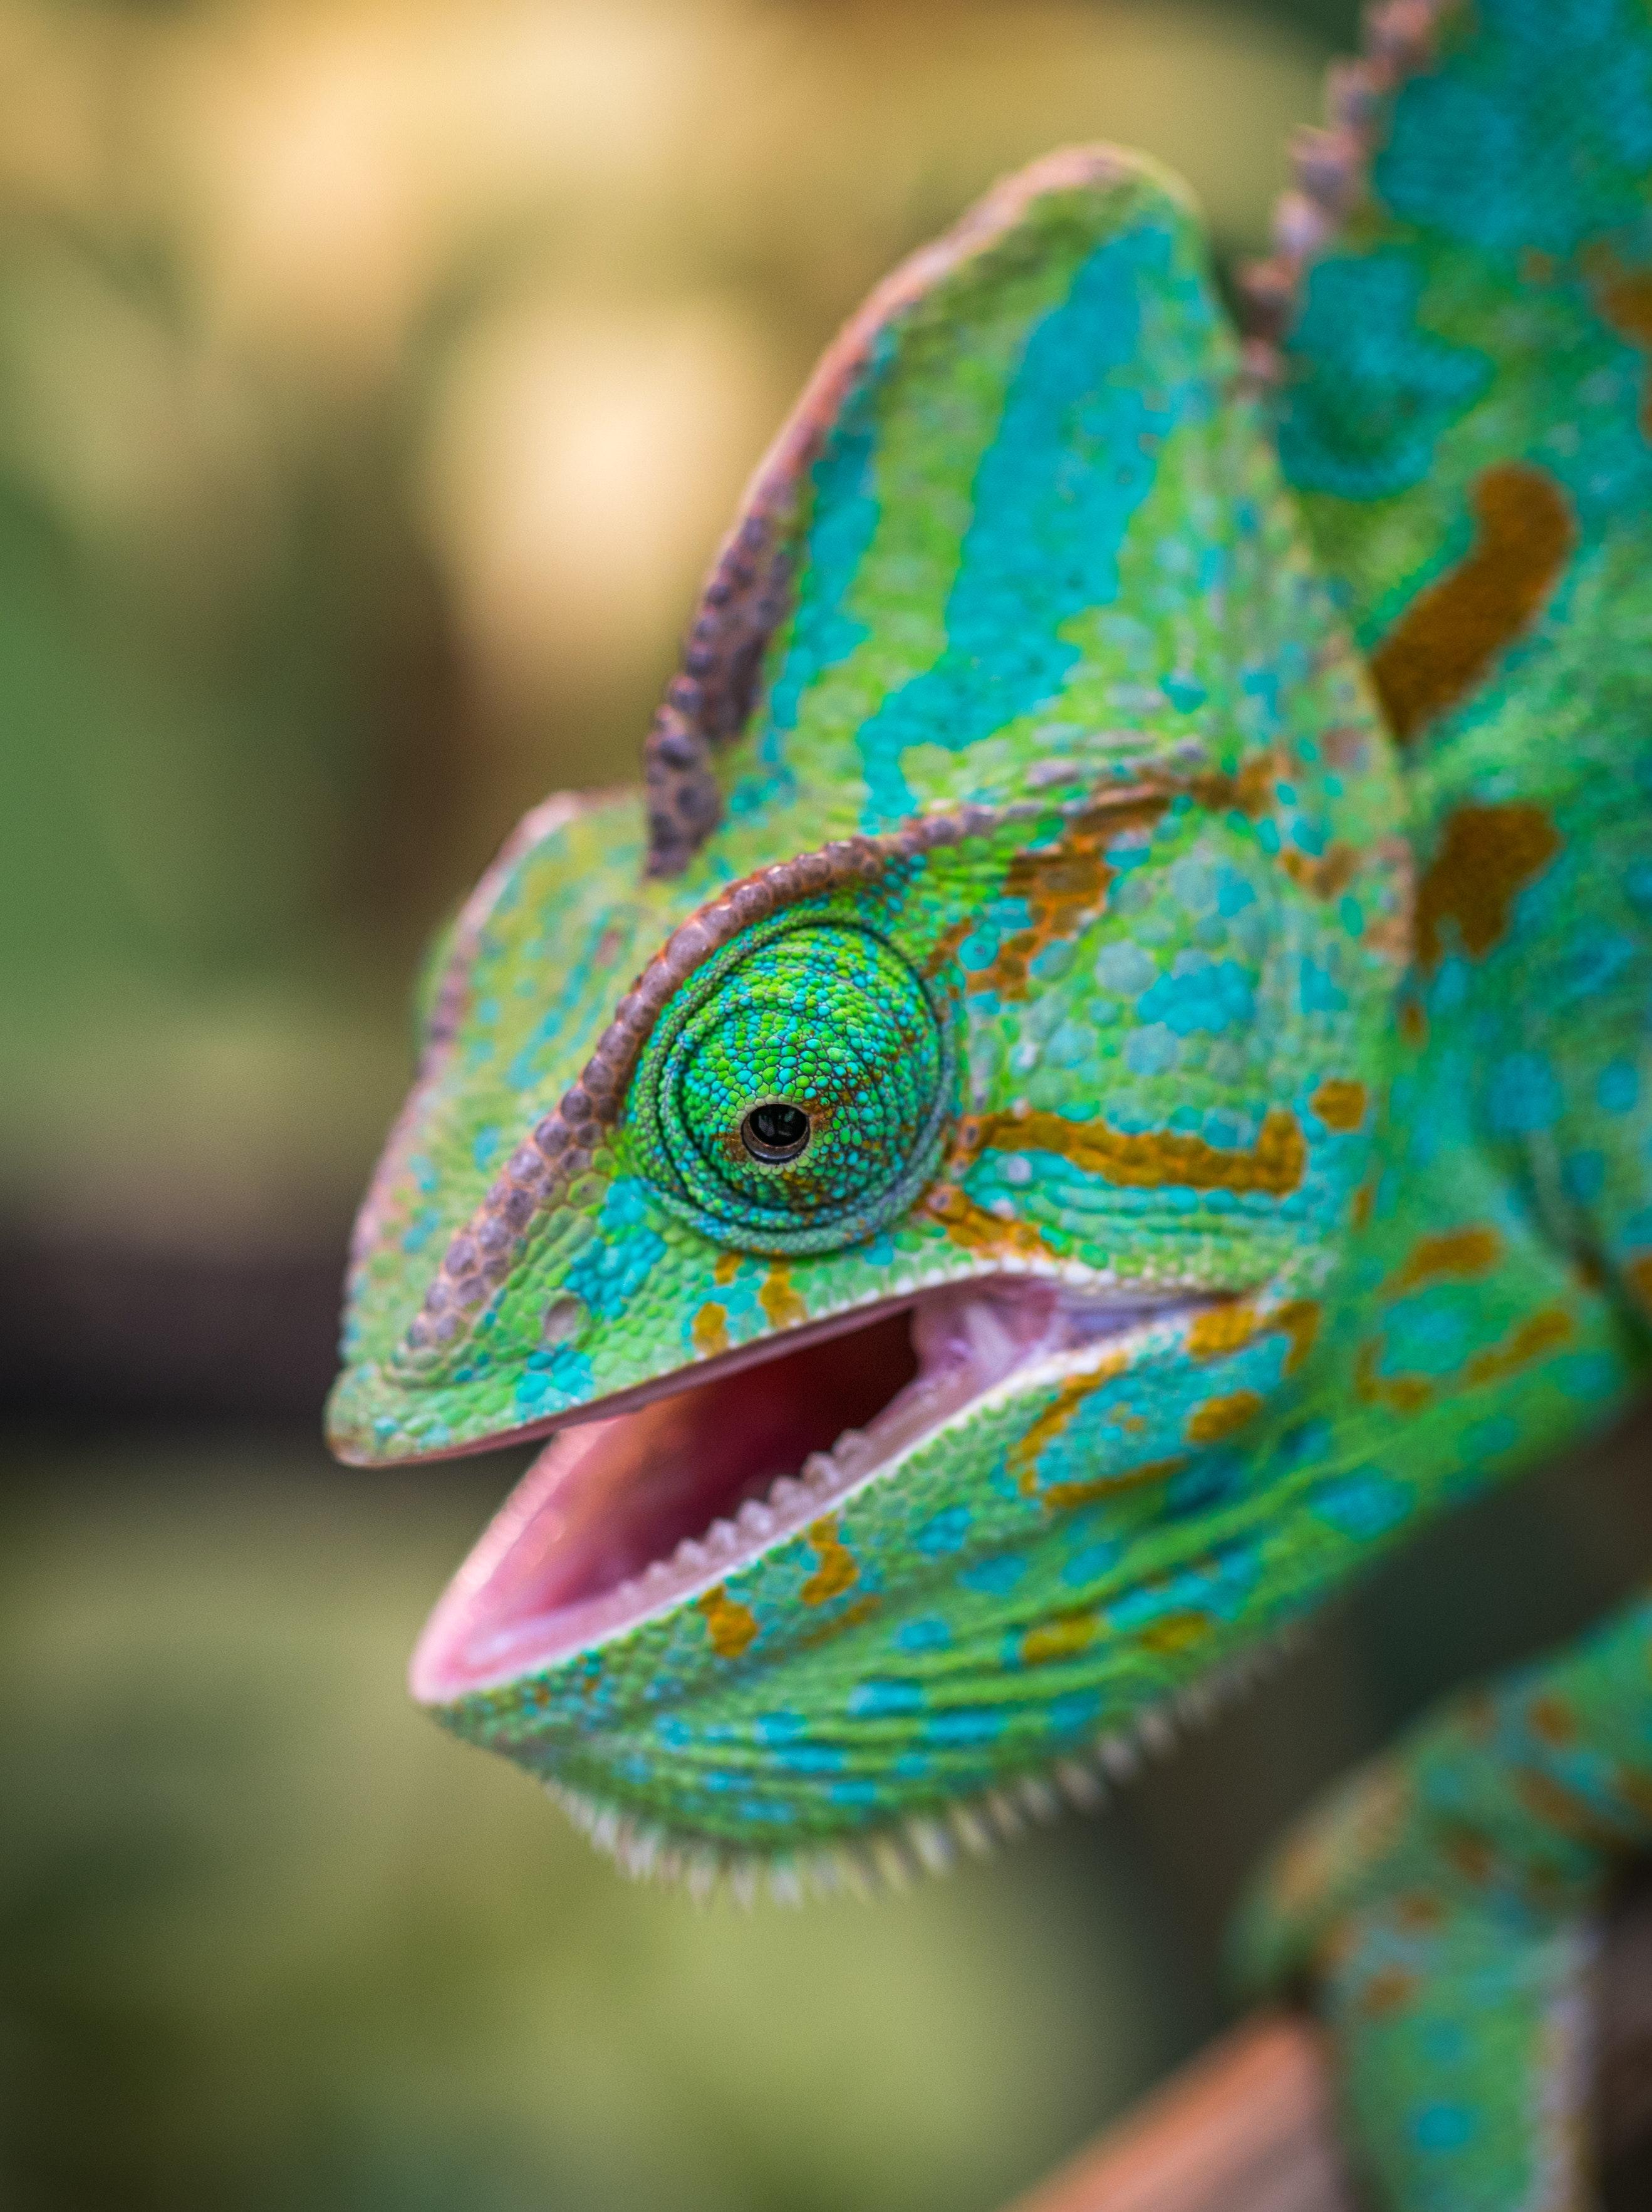 Green Chameleon · Free Stock Photo